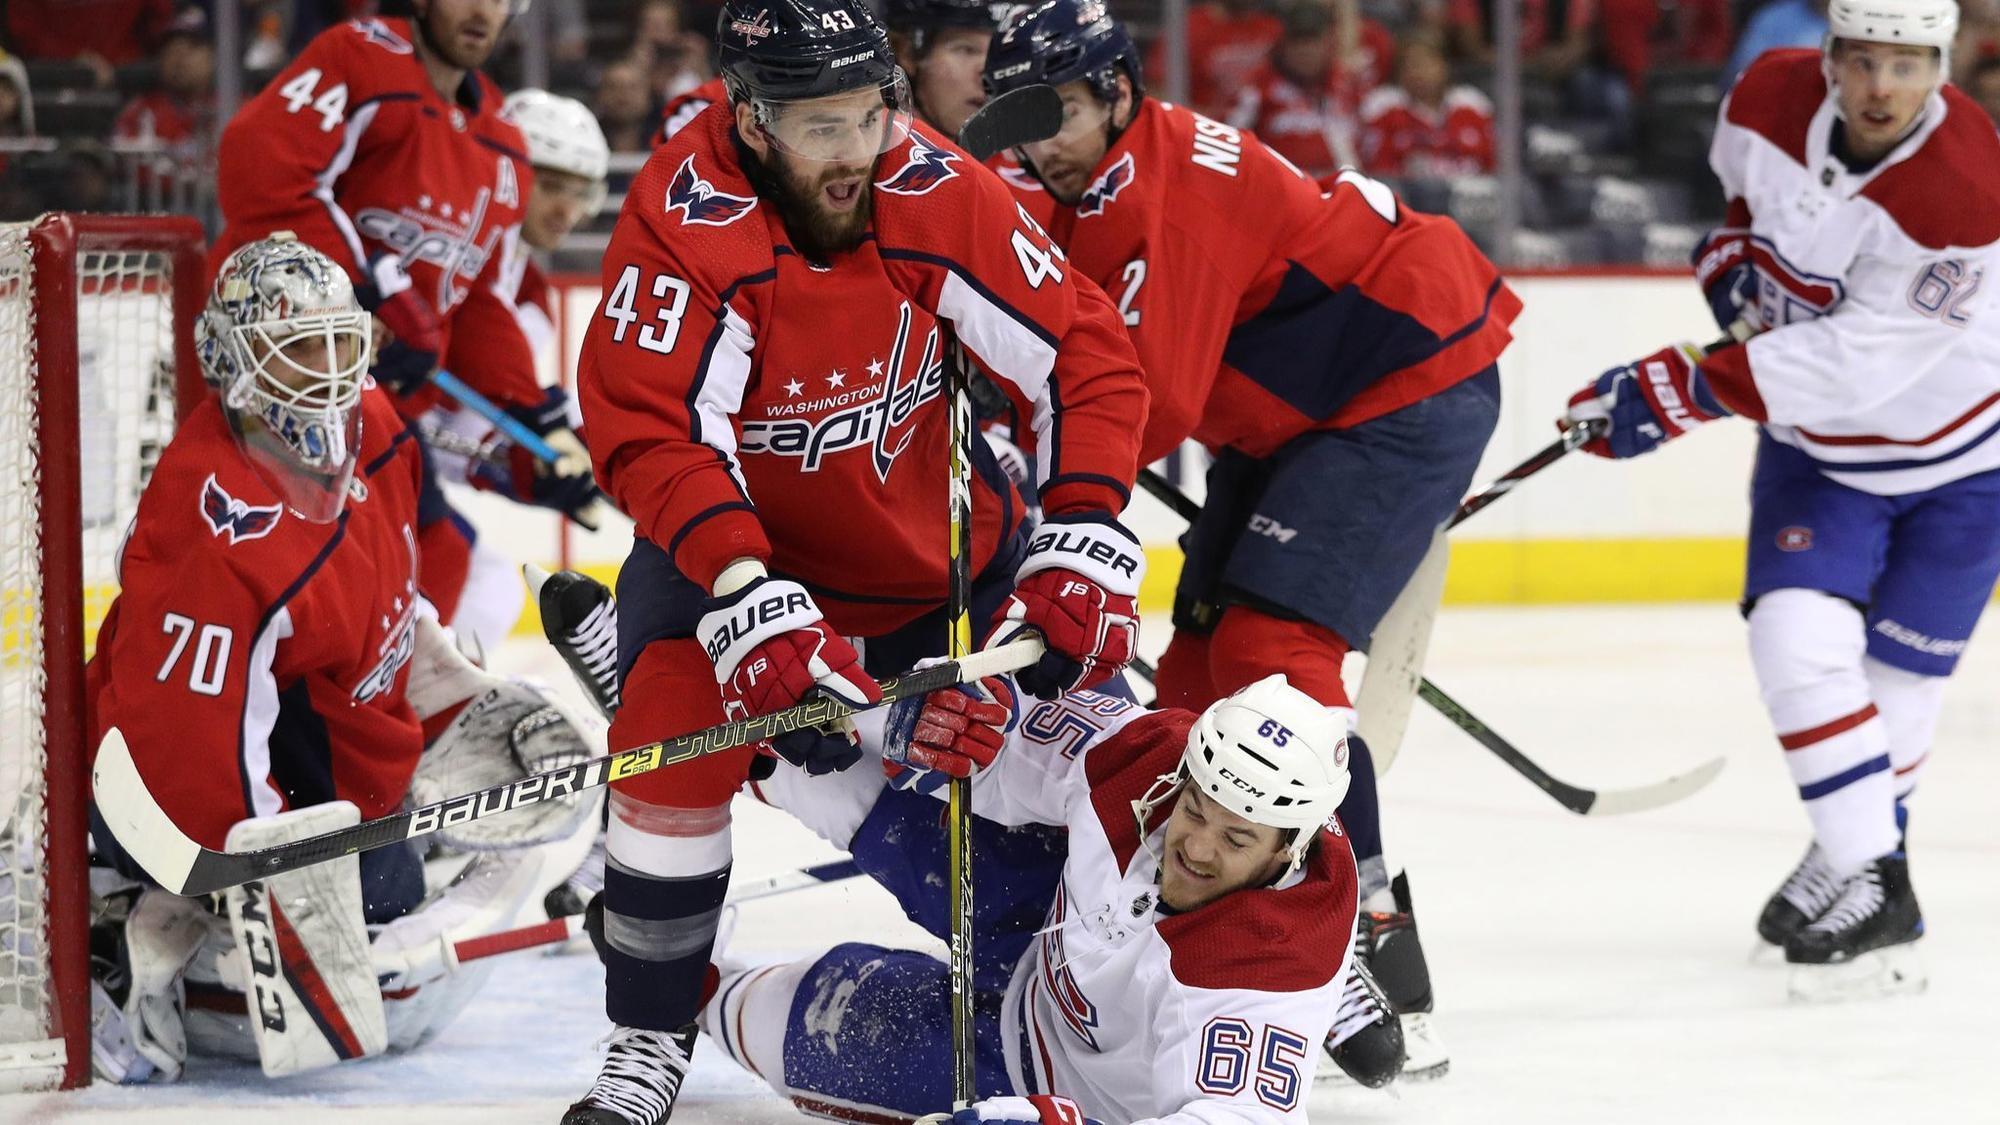 8b2890573d7 Capitals trip Canadiens, 2-1, claim fourth straight division title -  Baltimore Sun